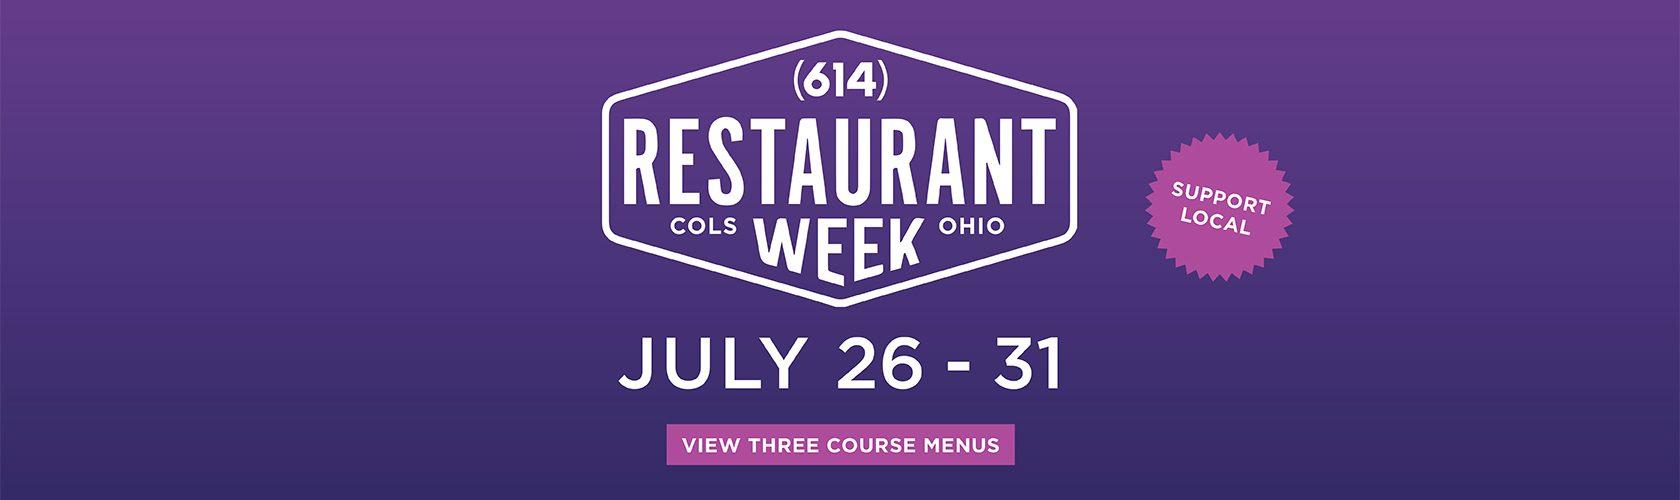 614 Restaurant Week July 26 - 31